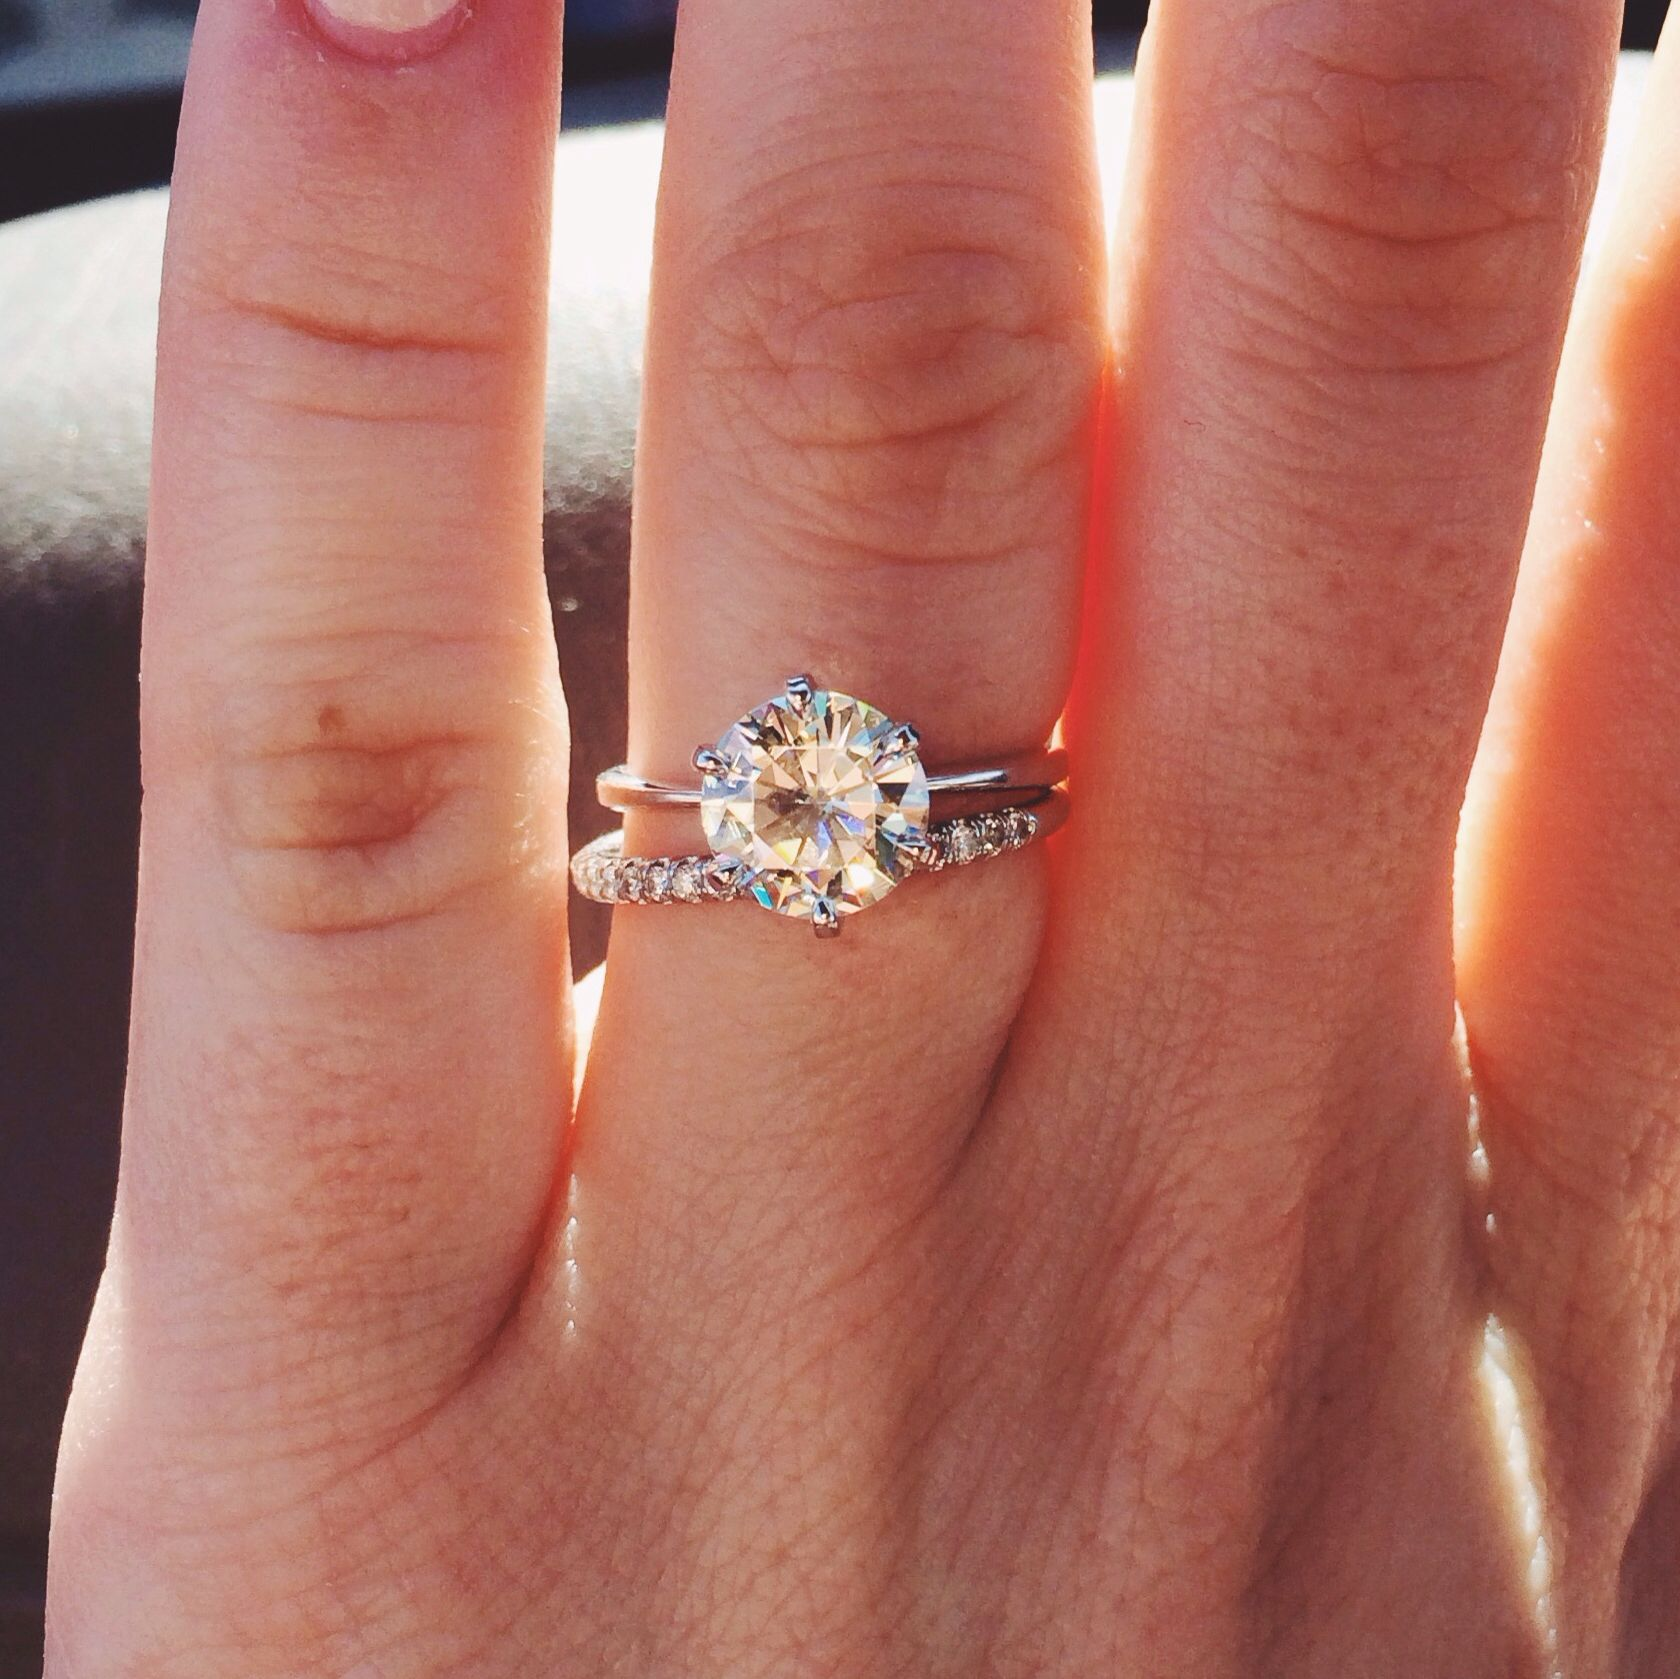 Wedding band that goes around engagement ring